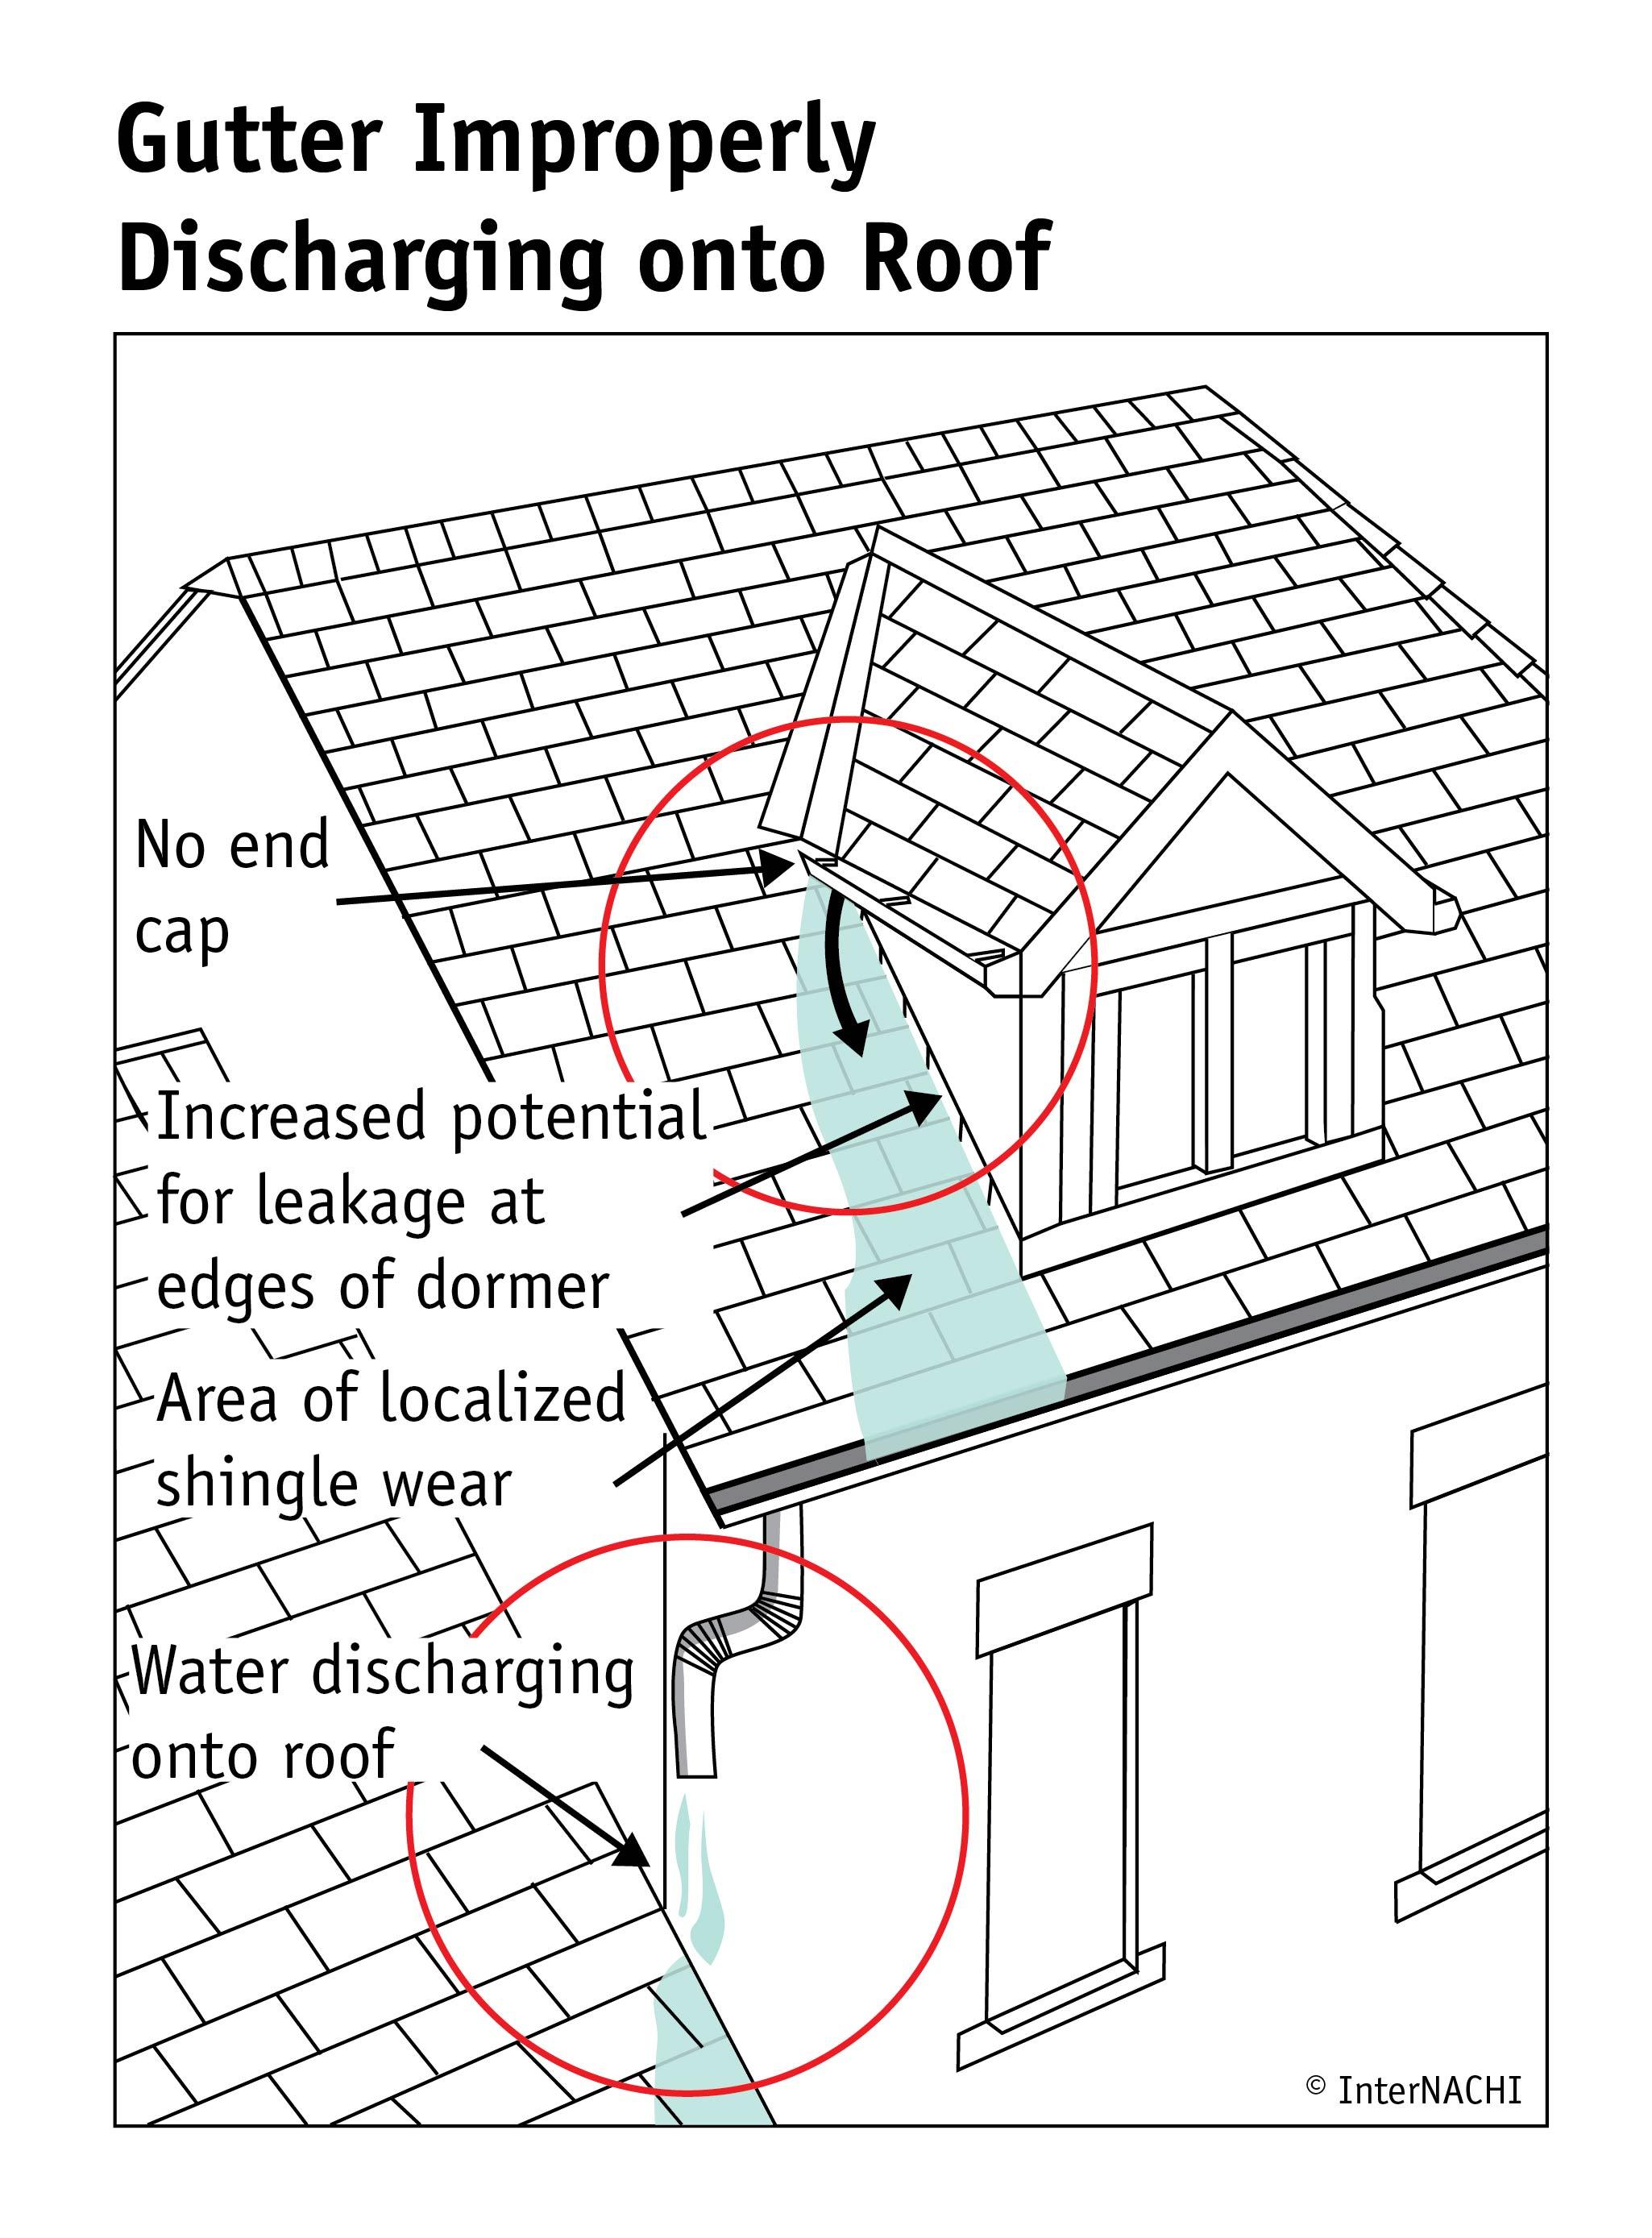 Gutter improperly discharging onto roof.